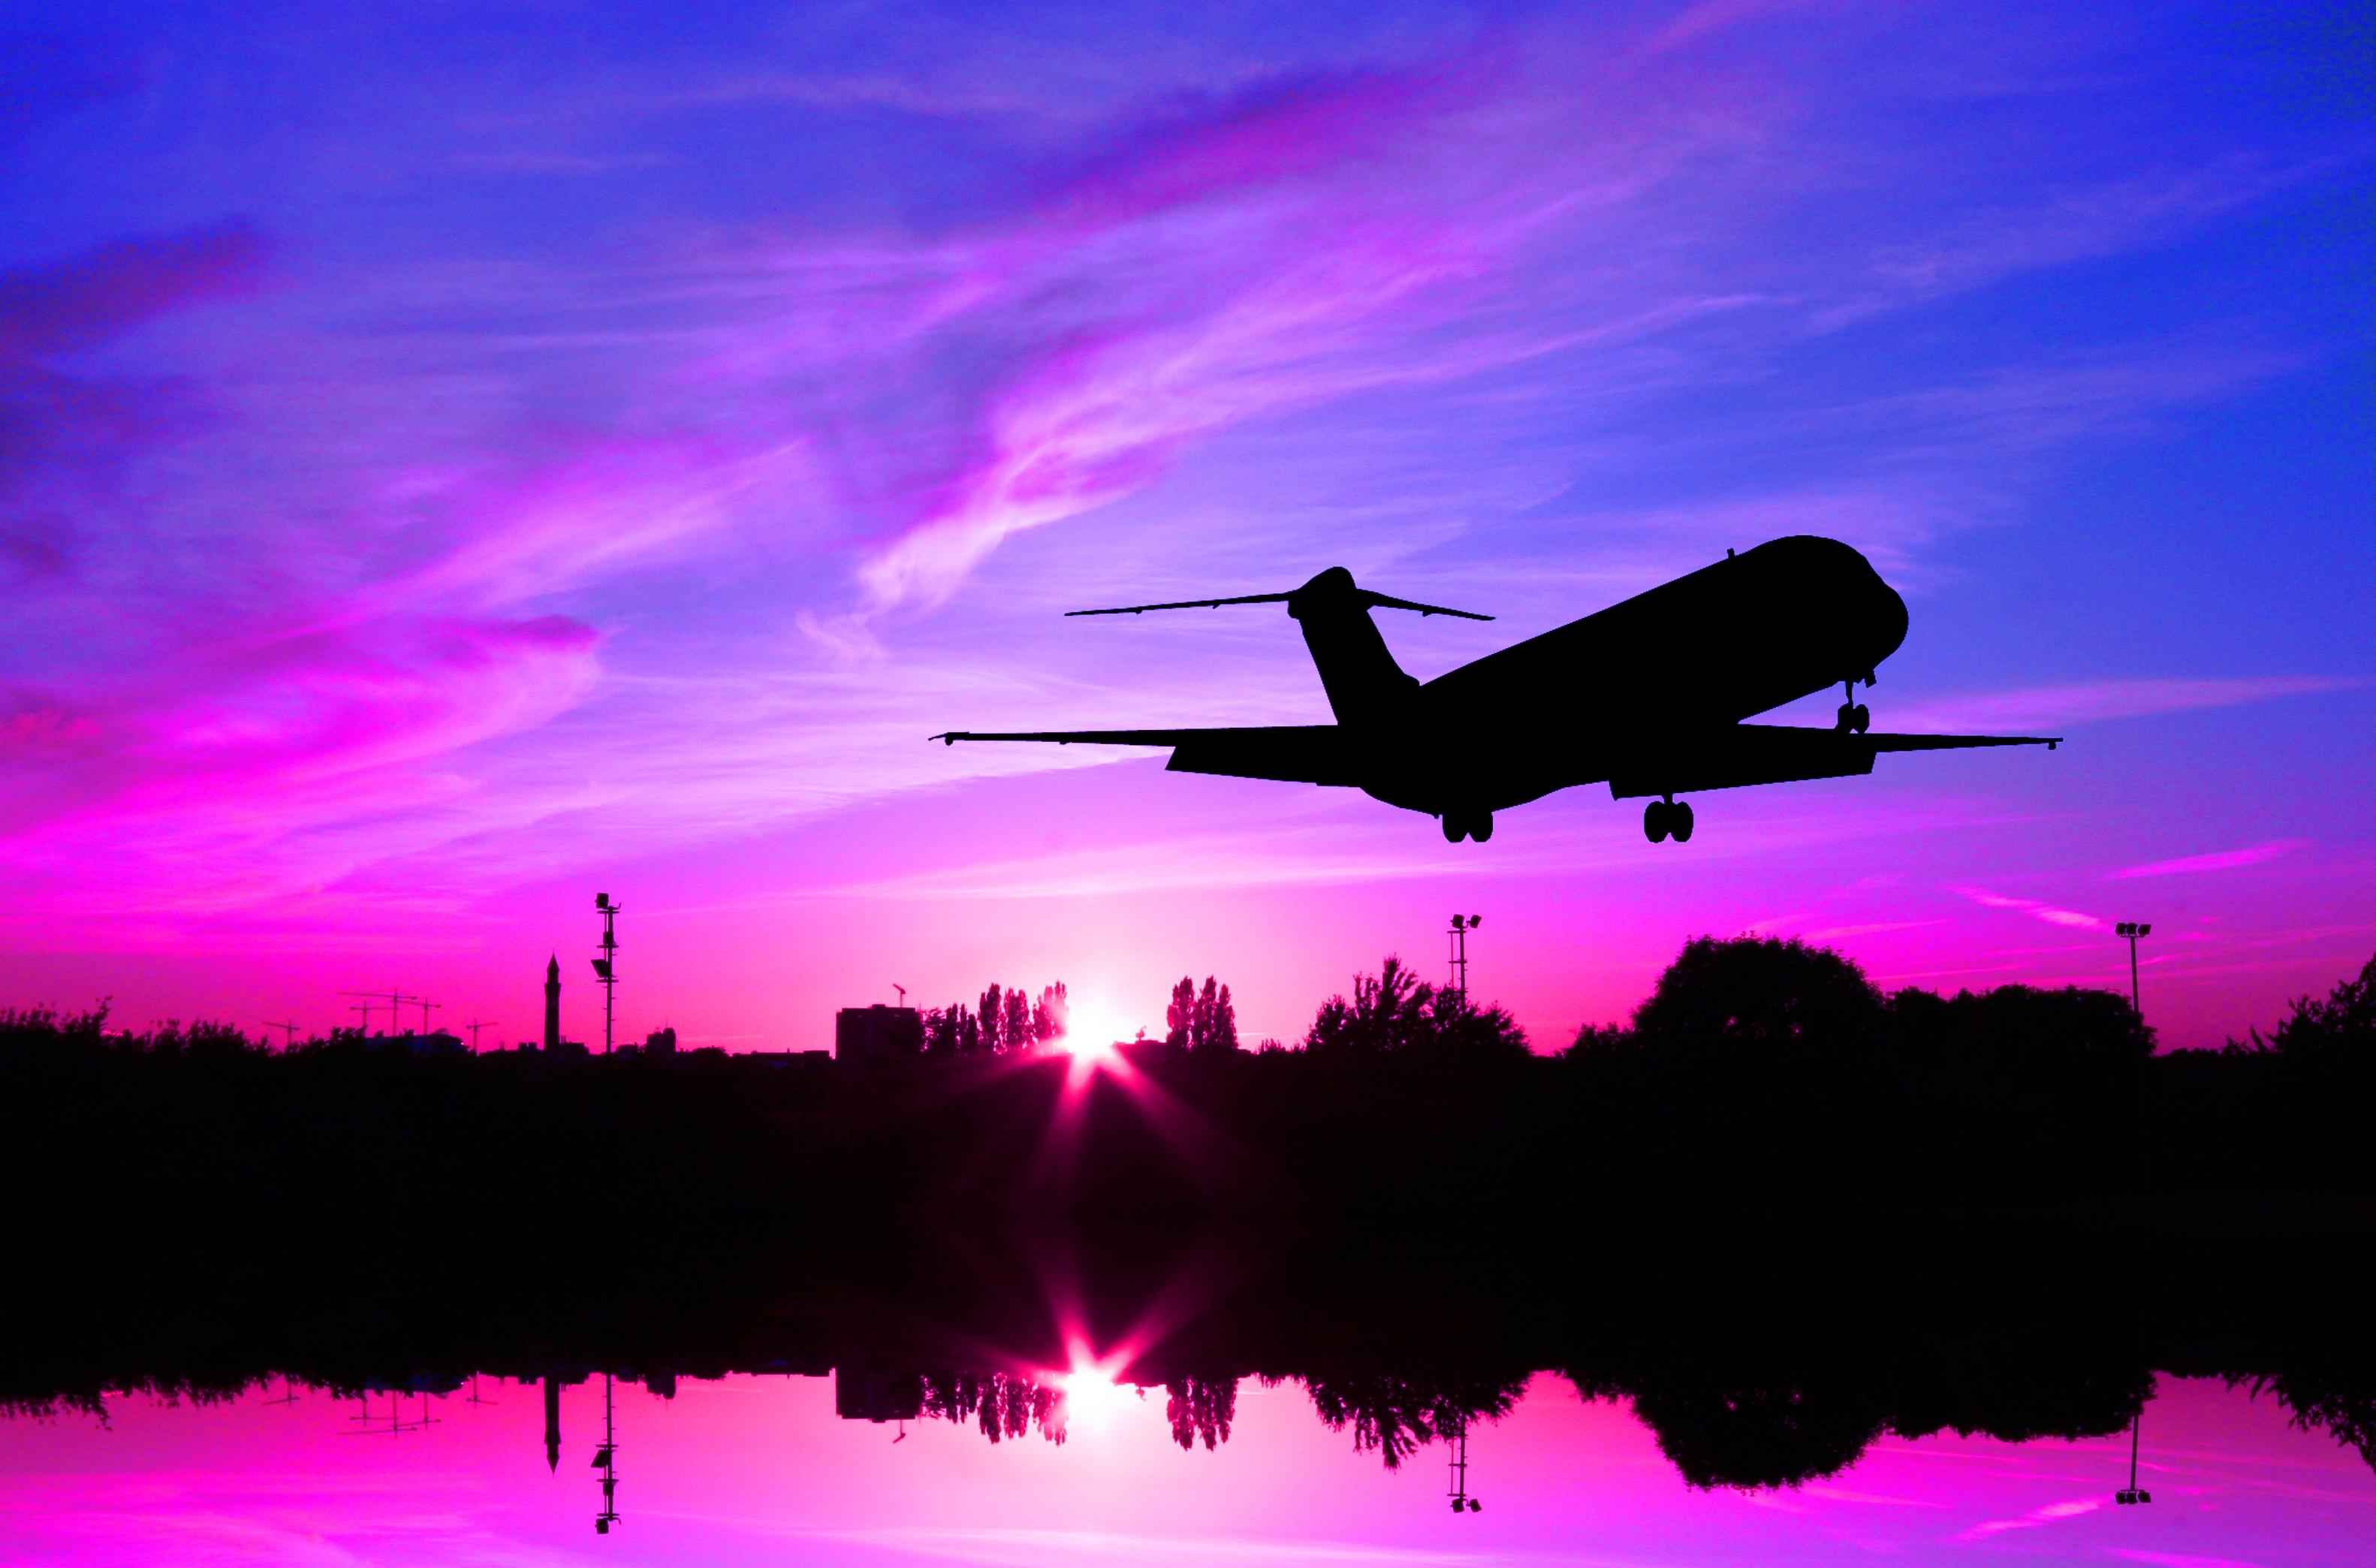 Wallpaper : pink, sunset, sky, silhouette, plane, airplane ...